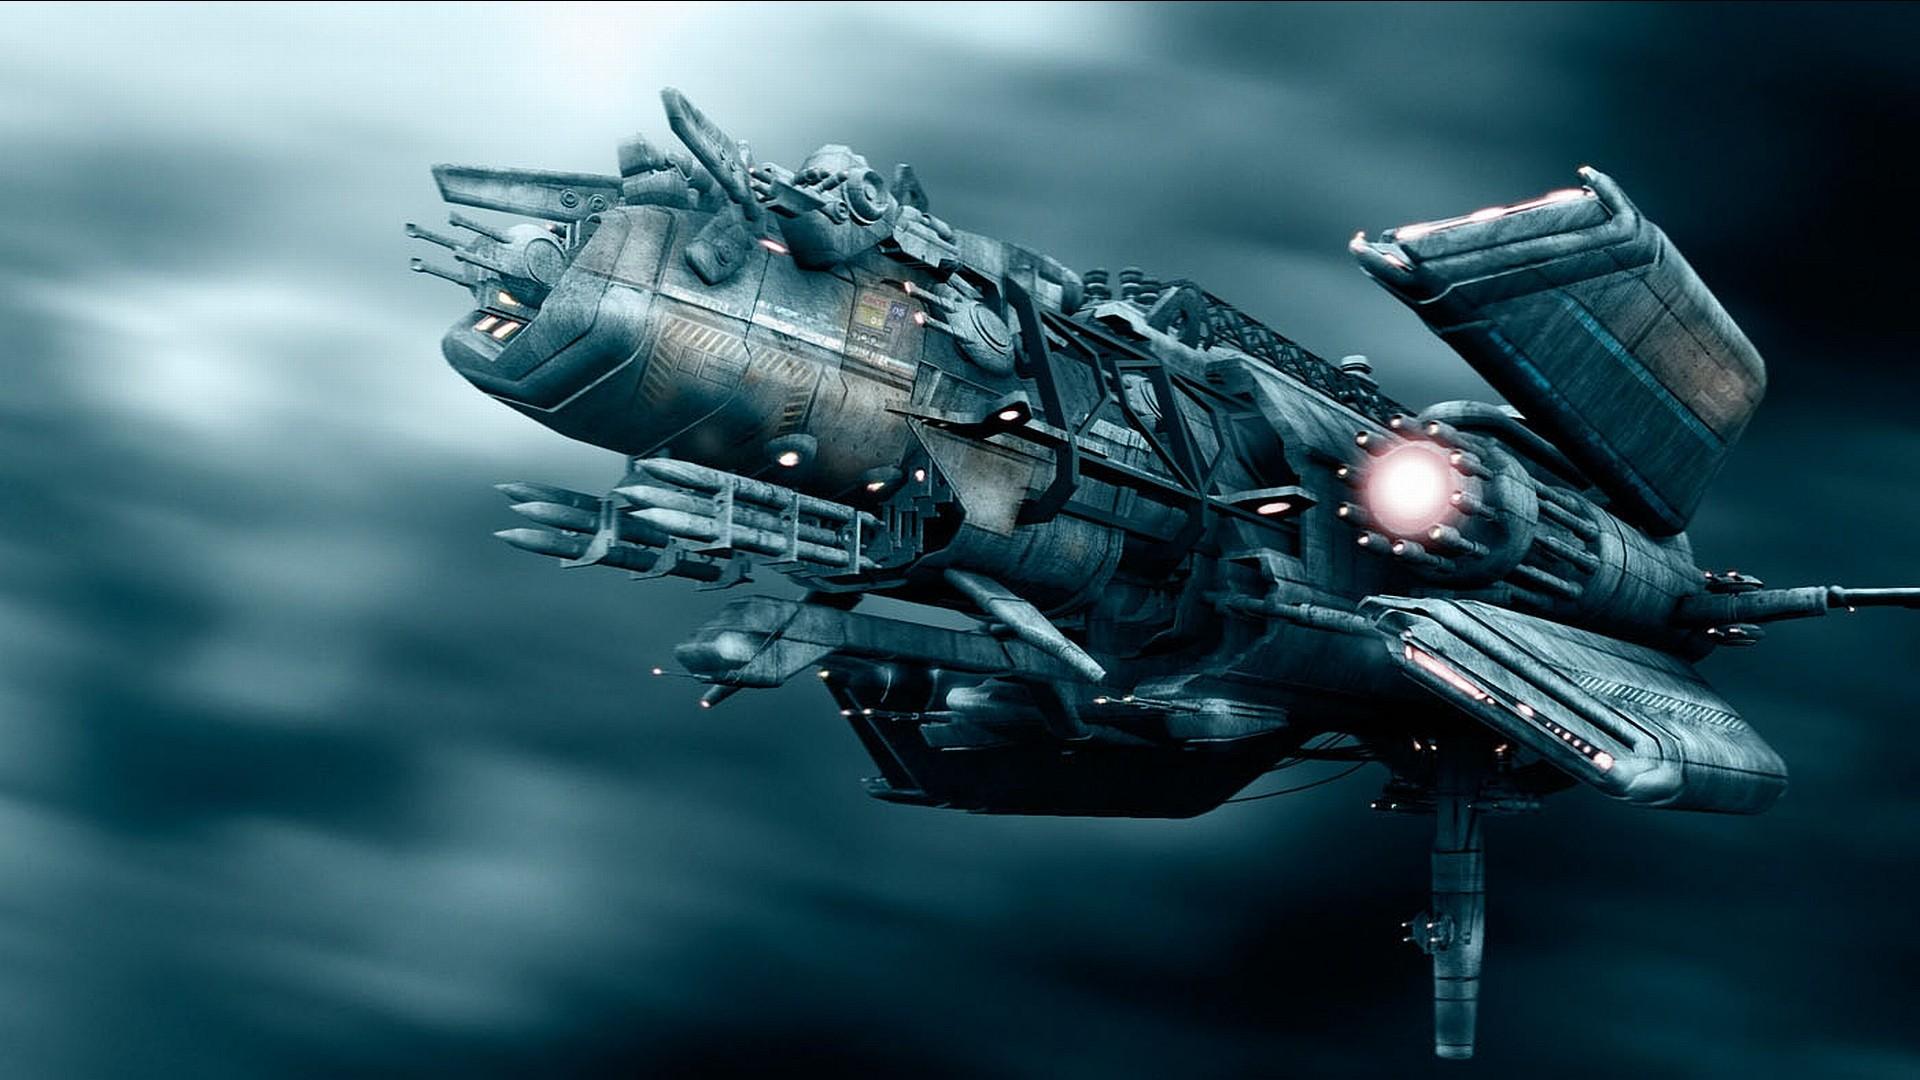 space ship wallpaper